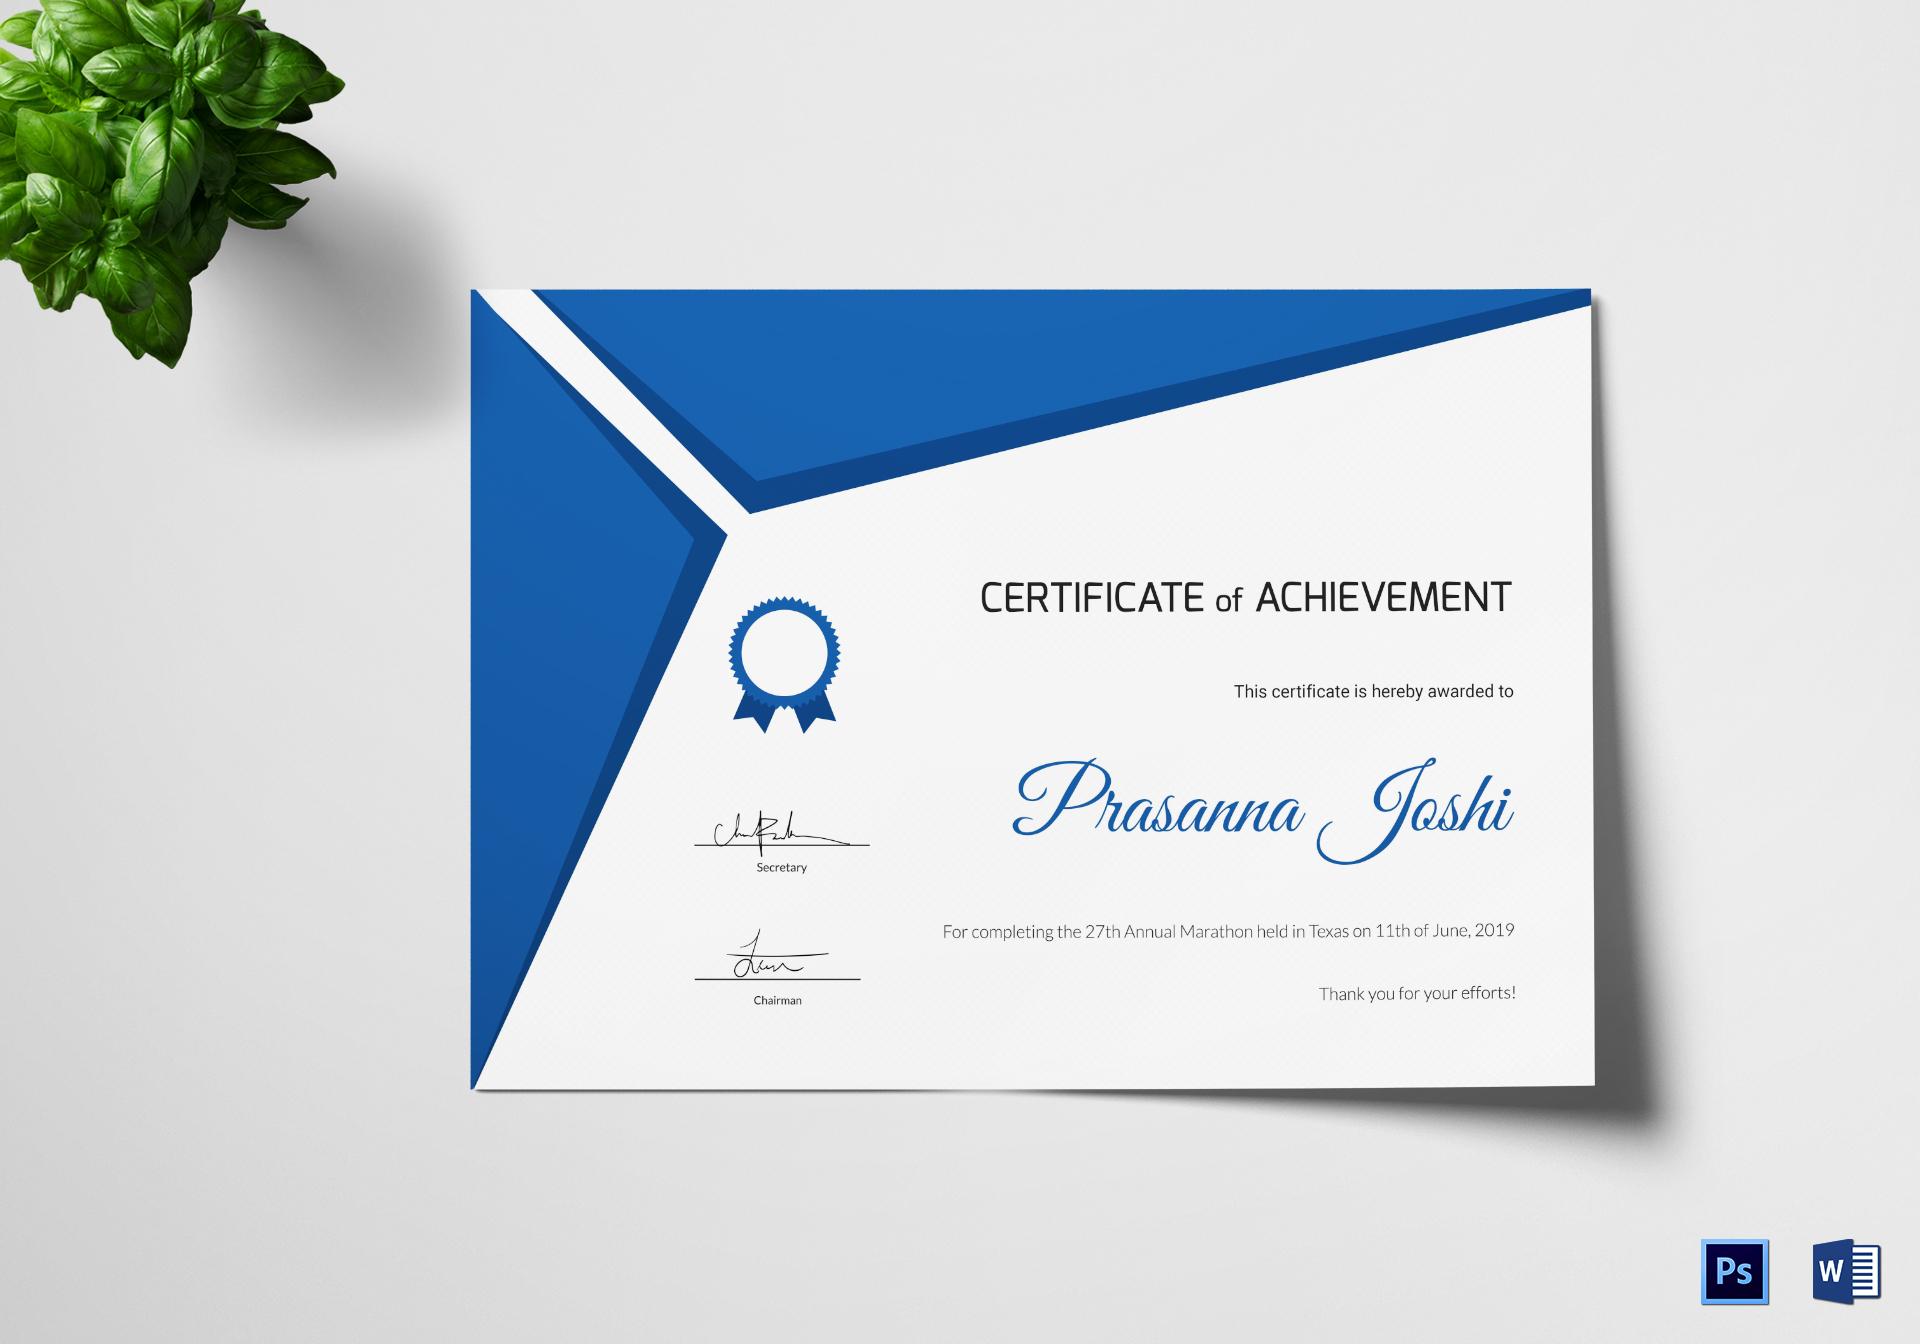 Certificate of Marathon Achievement Template